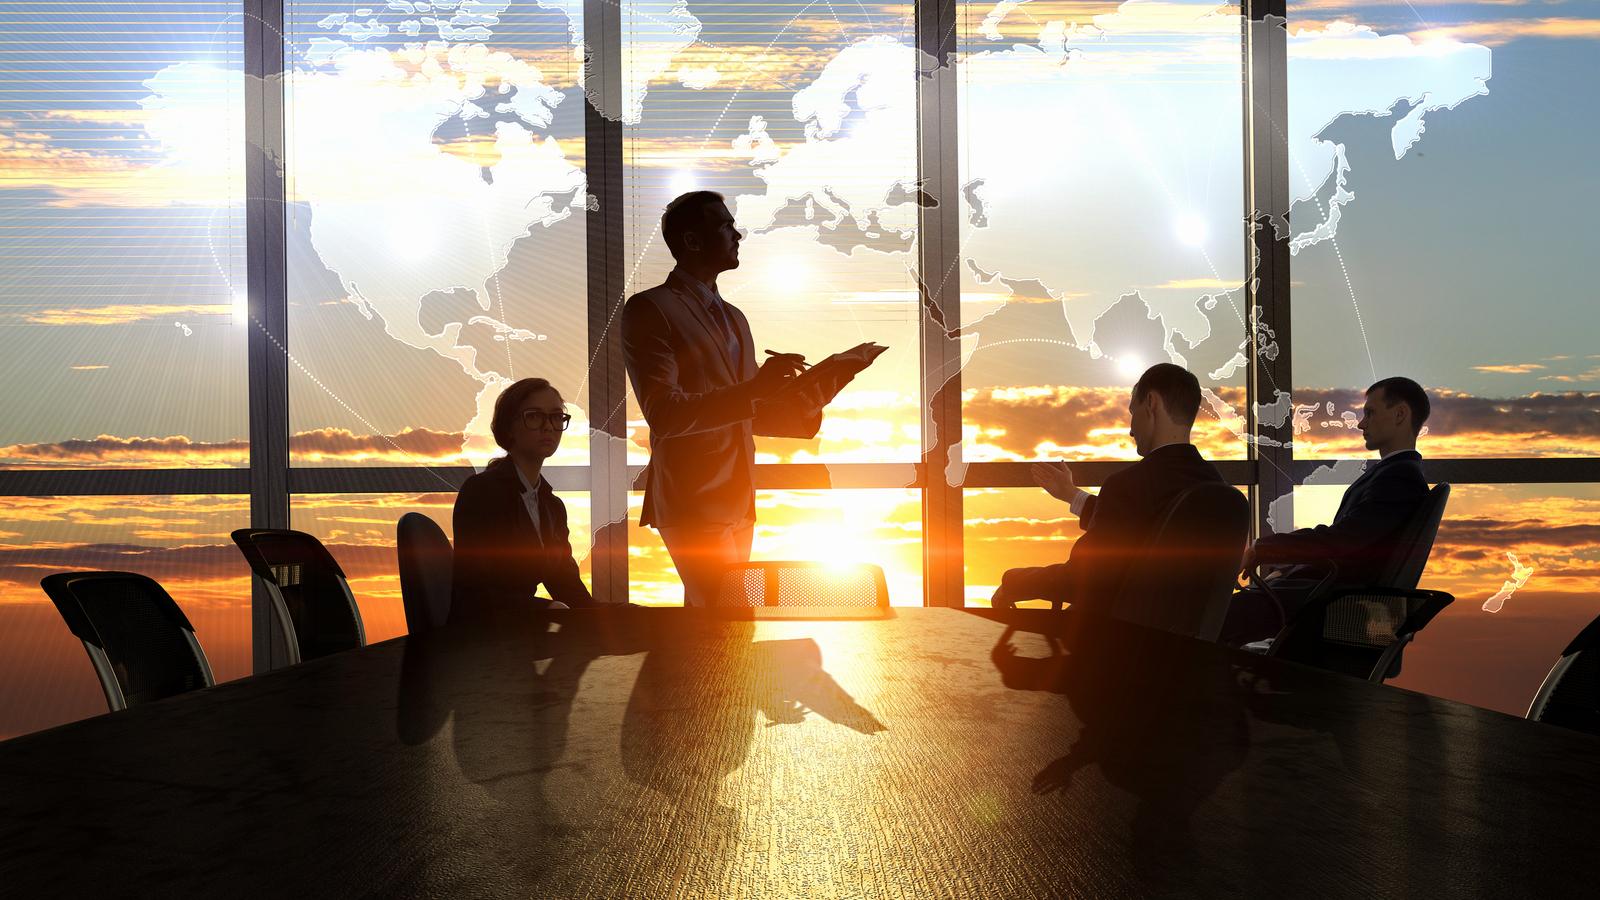 TCG Process expands international presence into ANZ market